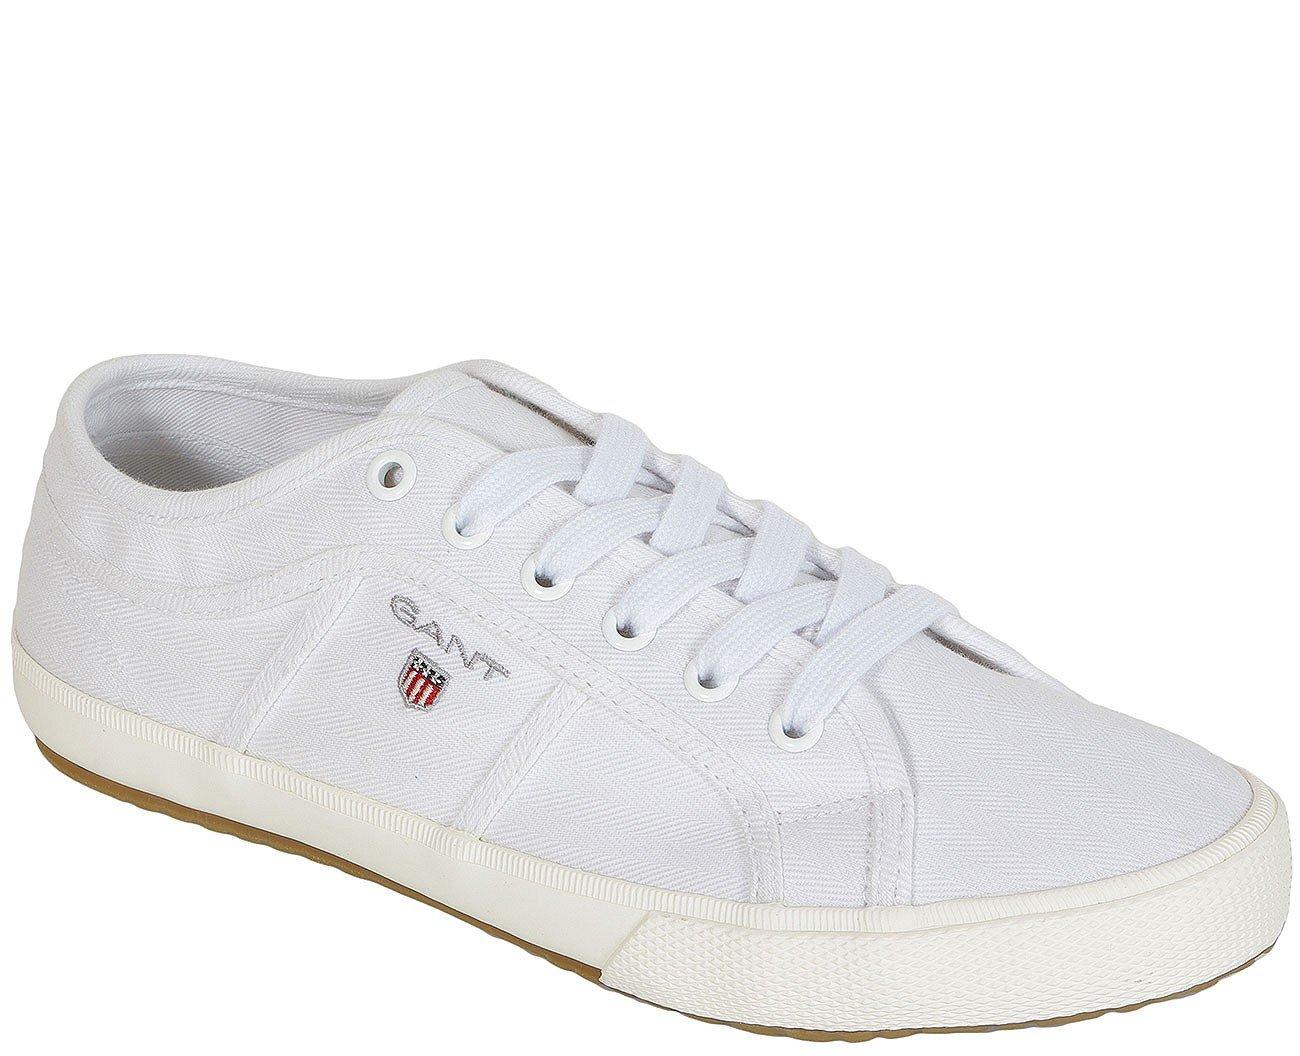 Gant Samuel Herringbone white sneakers